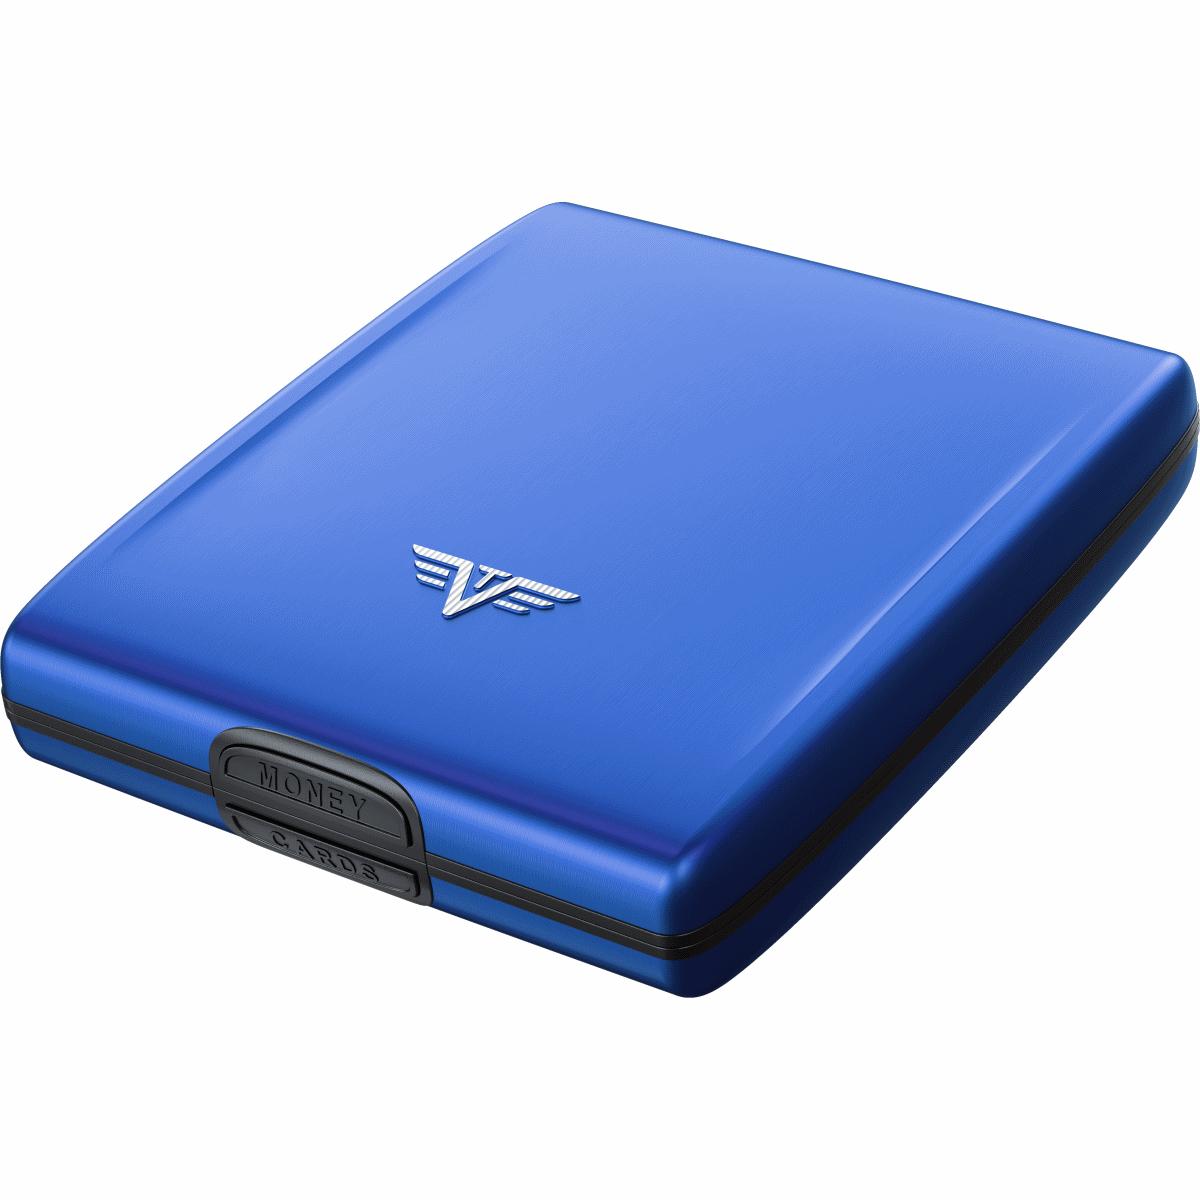 TRU VIRTU ארנק אלומיניום דגם Beluga - כחול